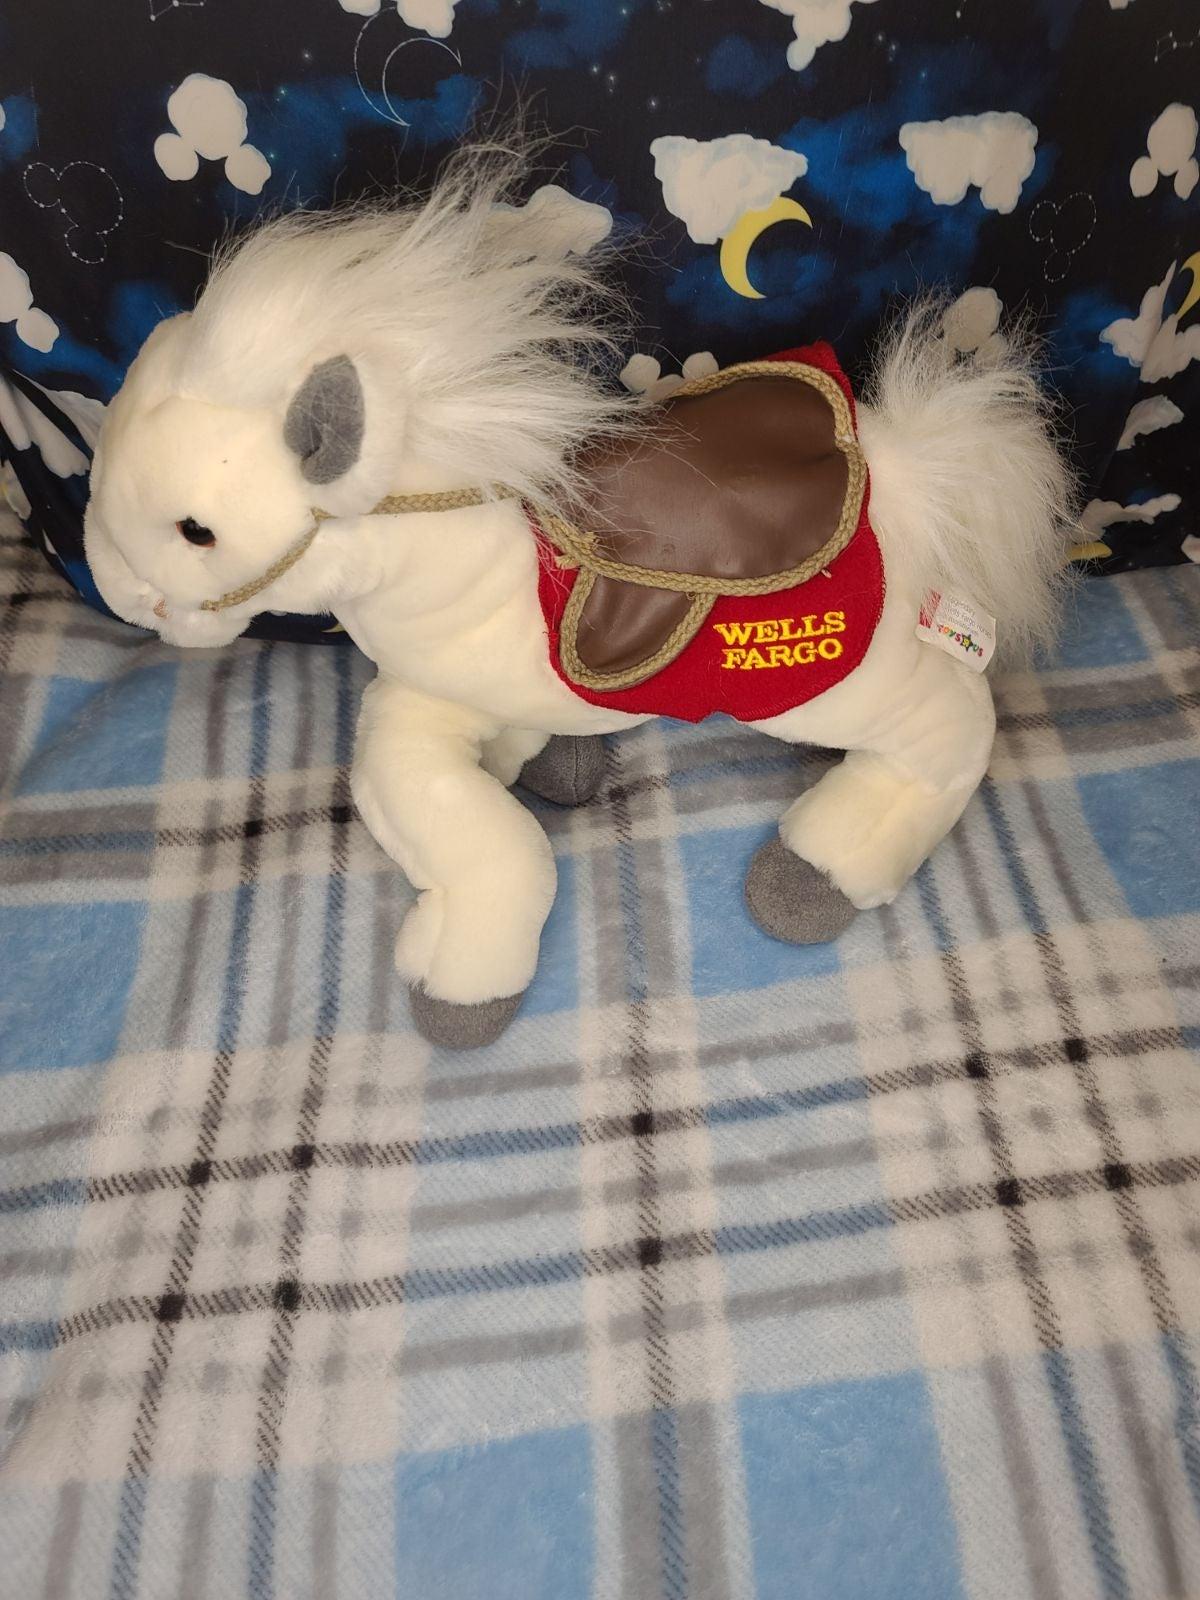 Wells Fargo Legendary Pony Plush